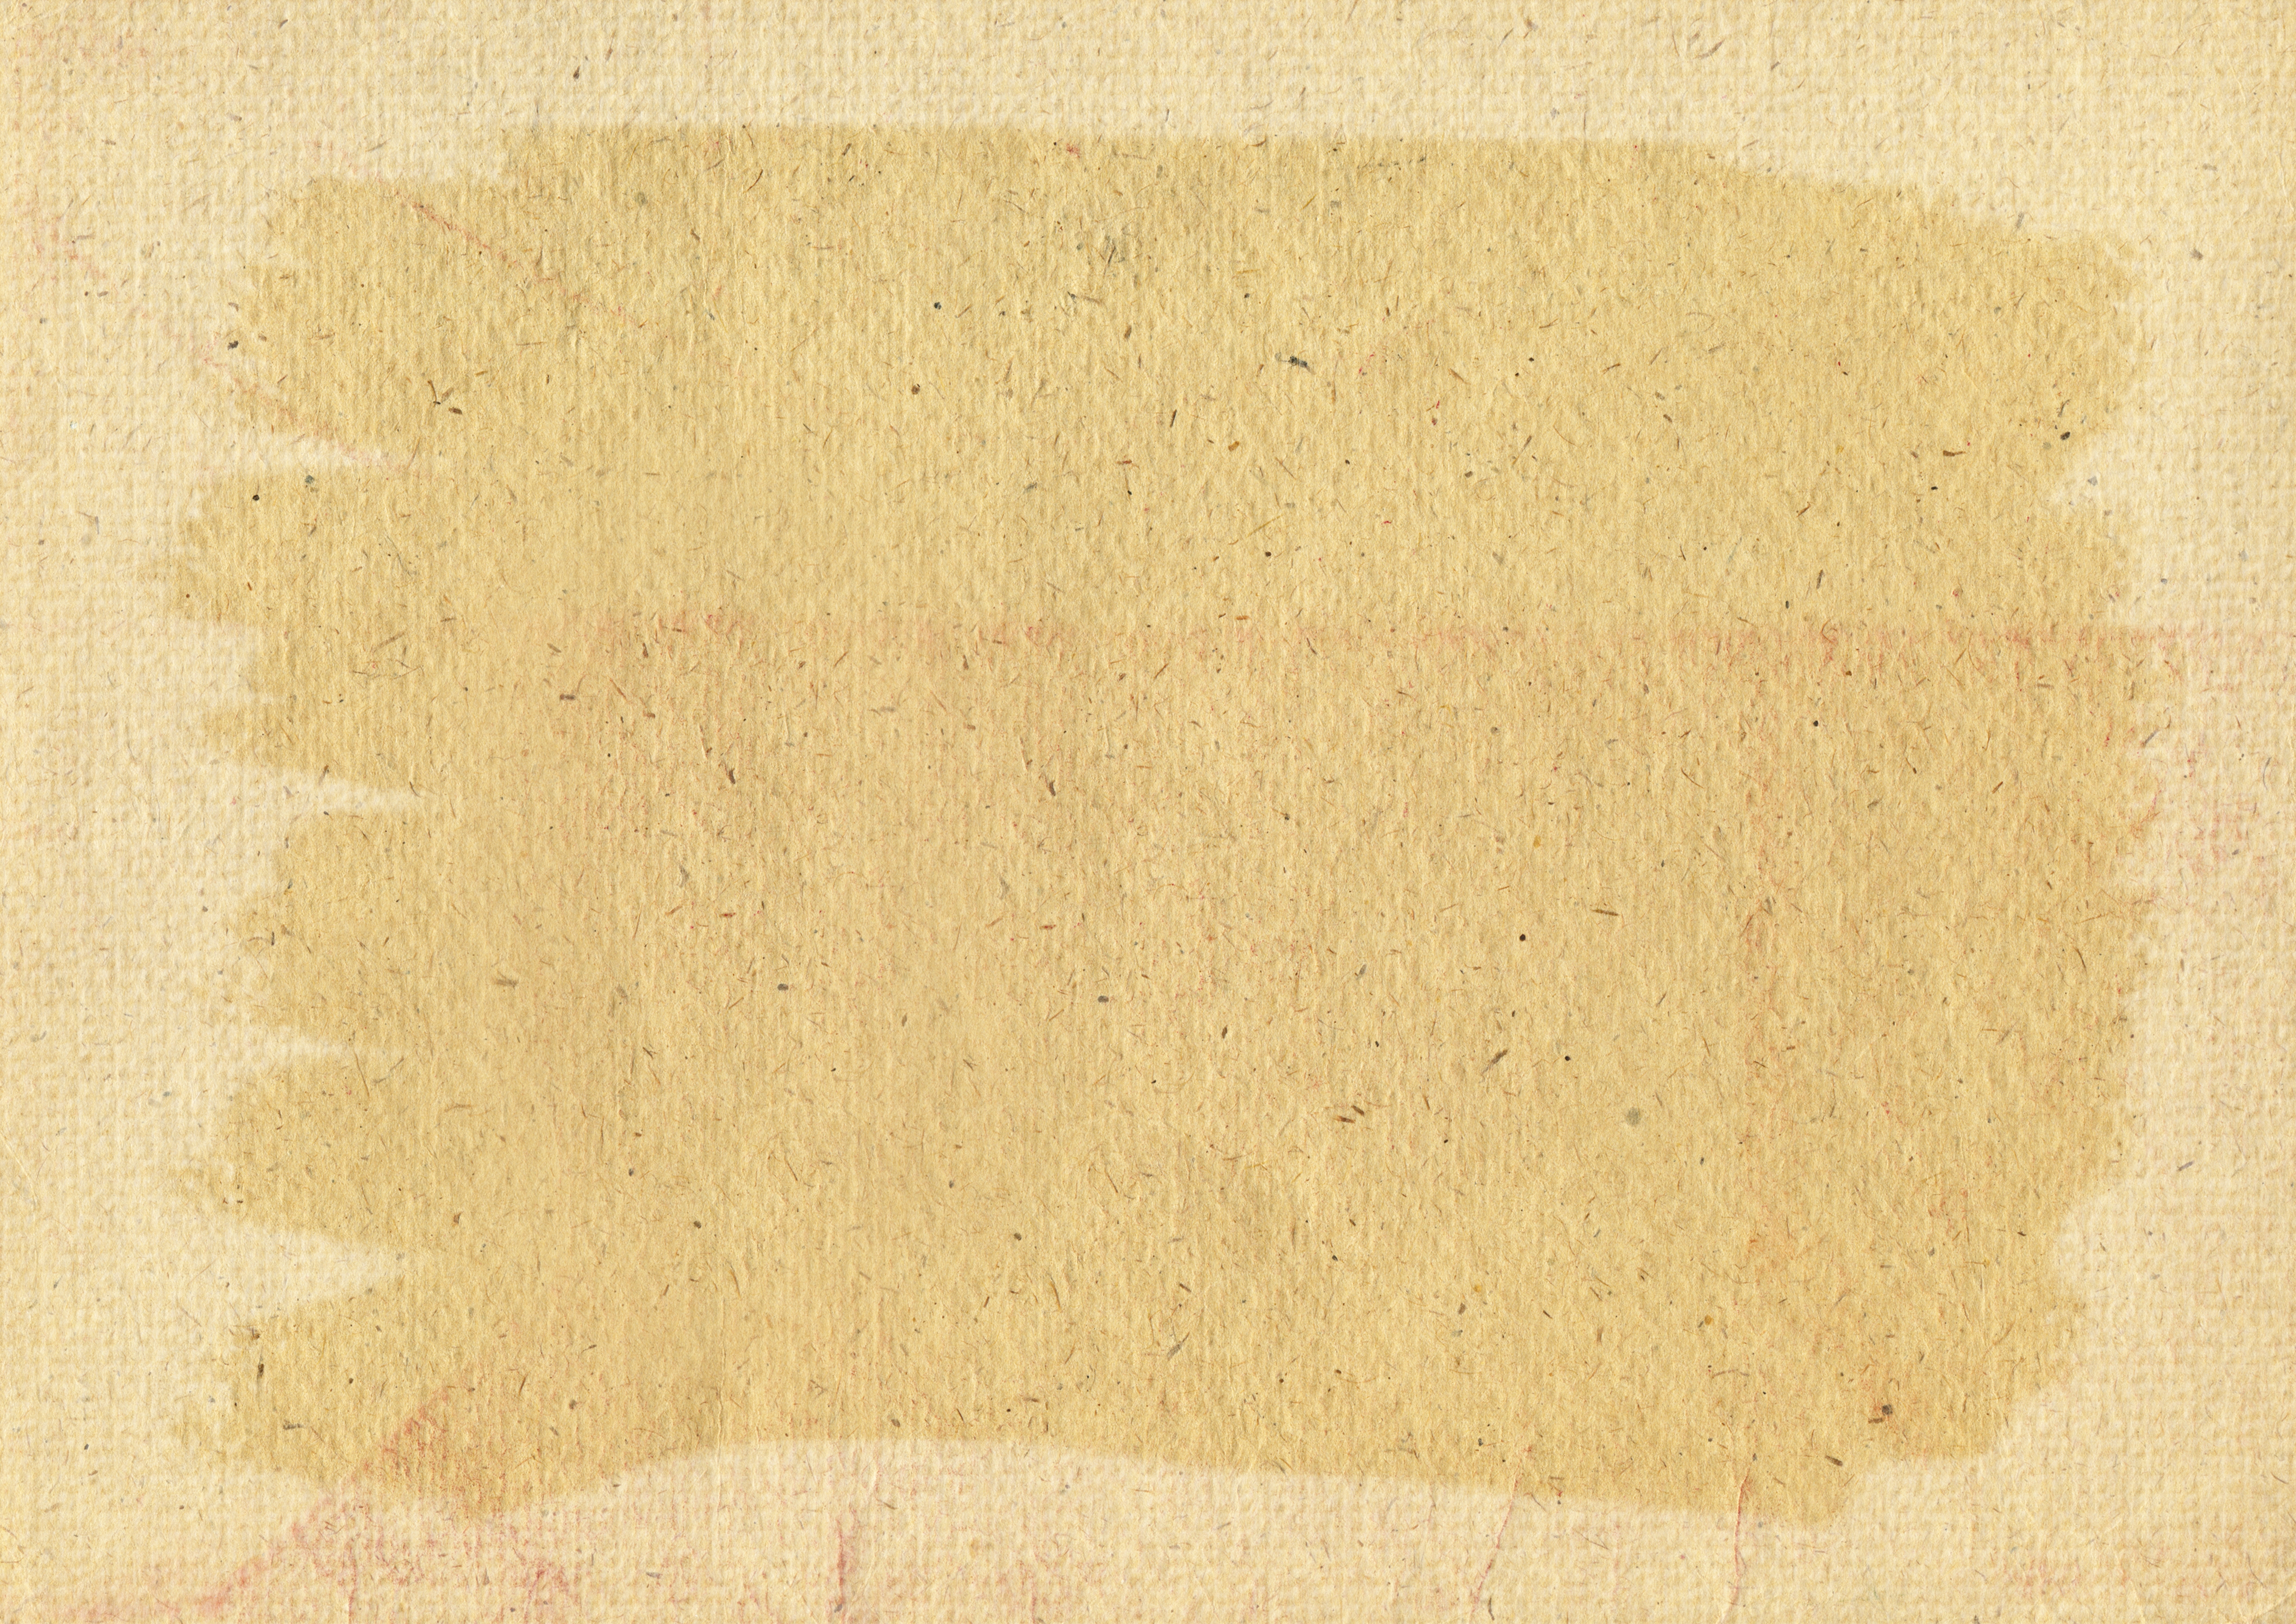 Old grunge vintage texture photo